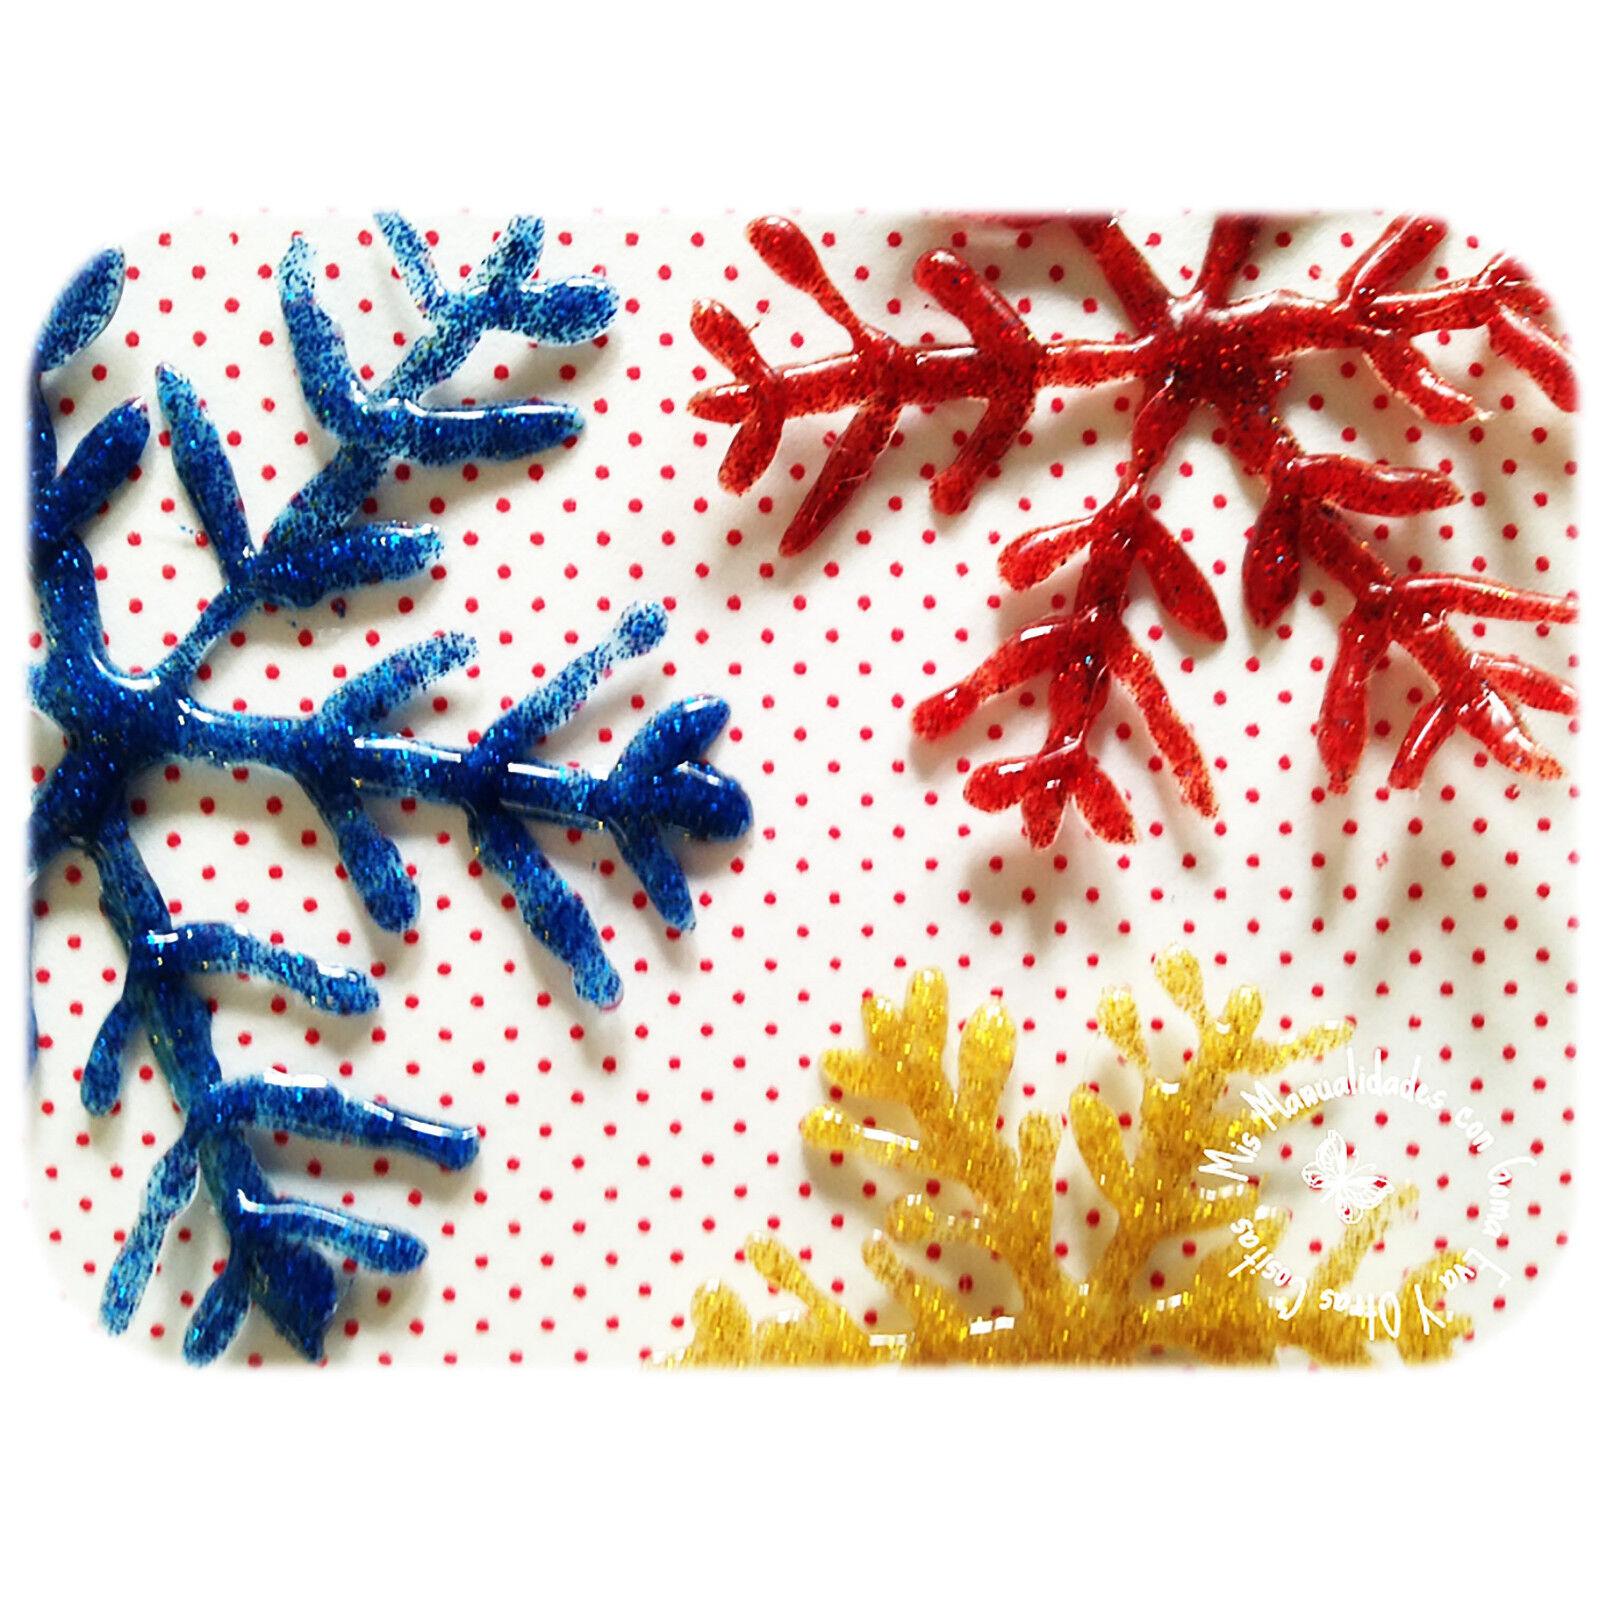 Momorain El PLA de filamento 3D duradero de alta resistencia suministra material de impresi/ón de filamento de impresora 3D de 1.75 mm para la impresora 3D de pluma de impresi/ón 3D